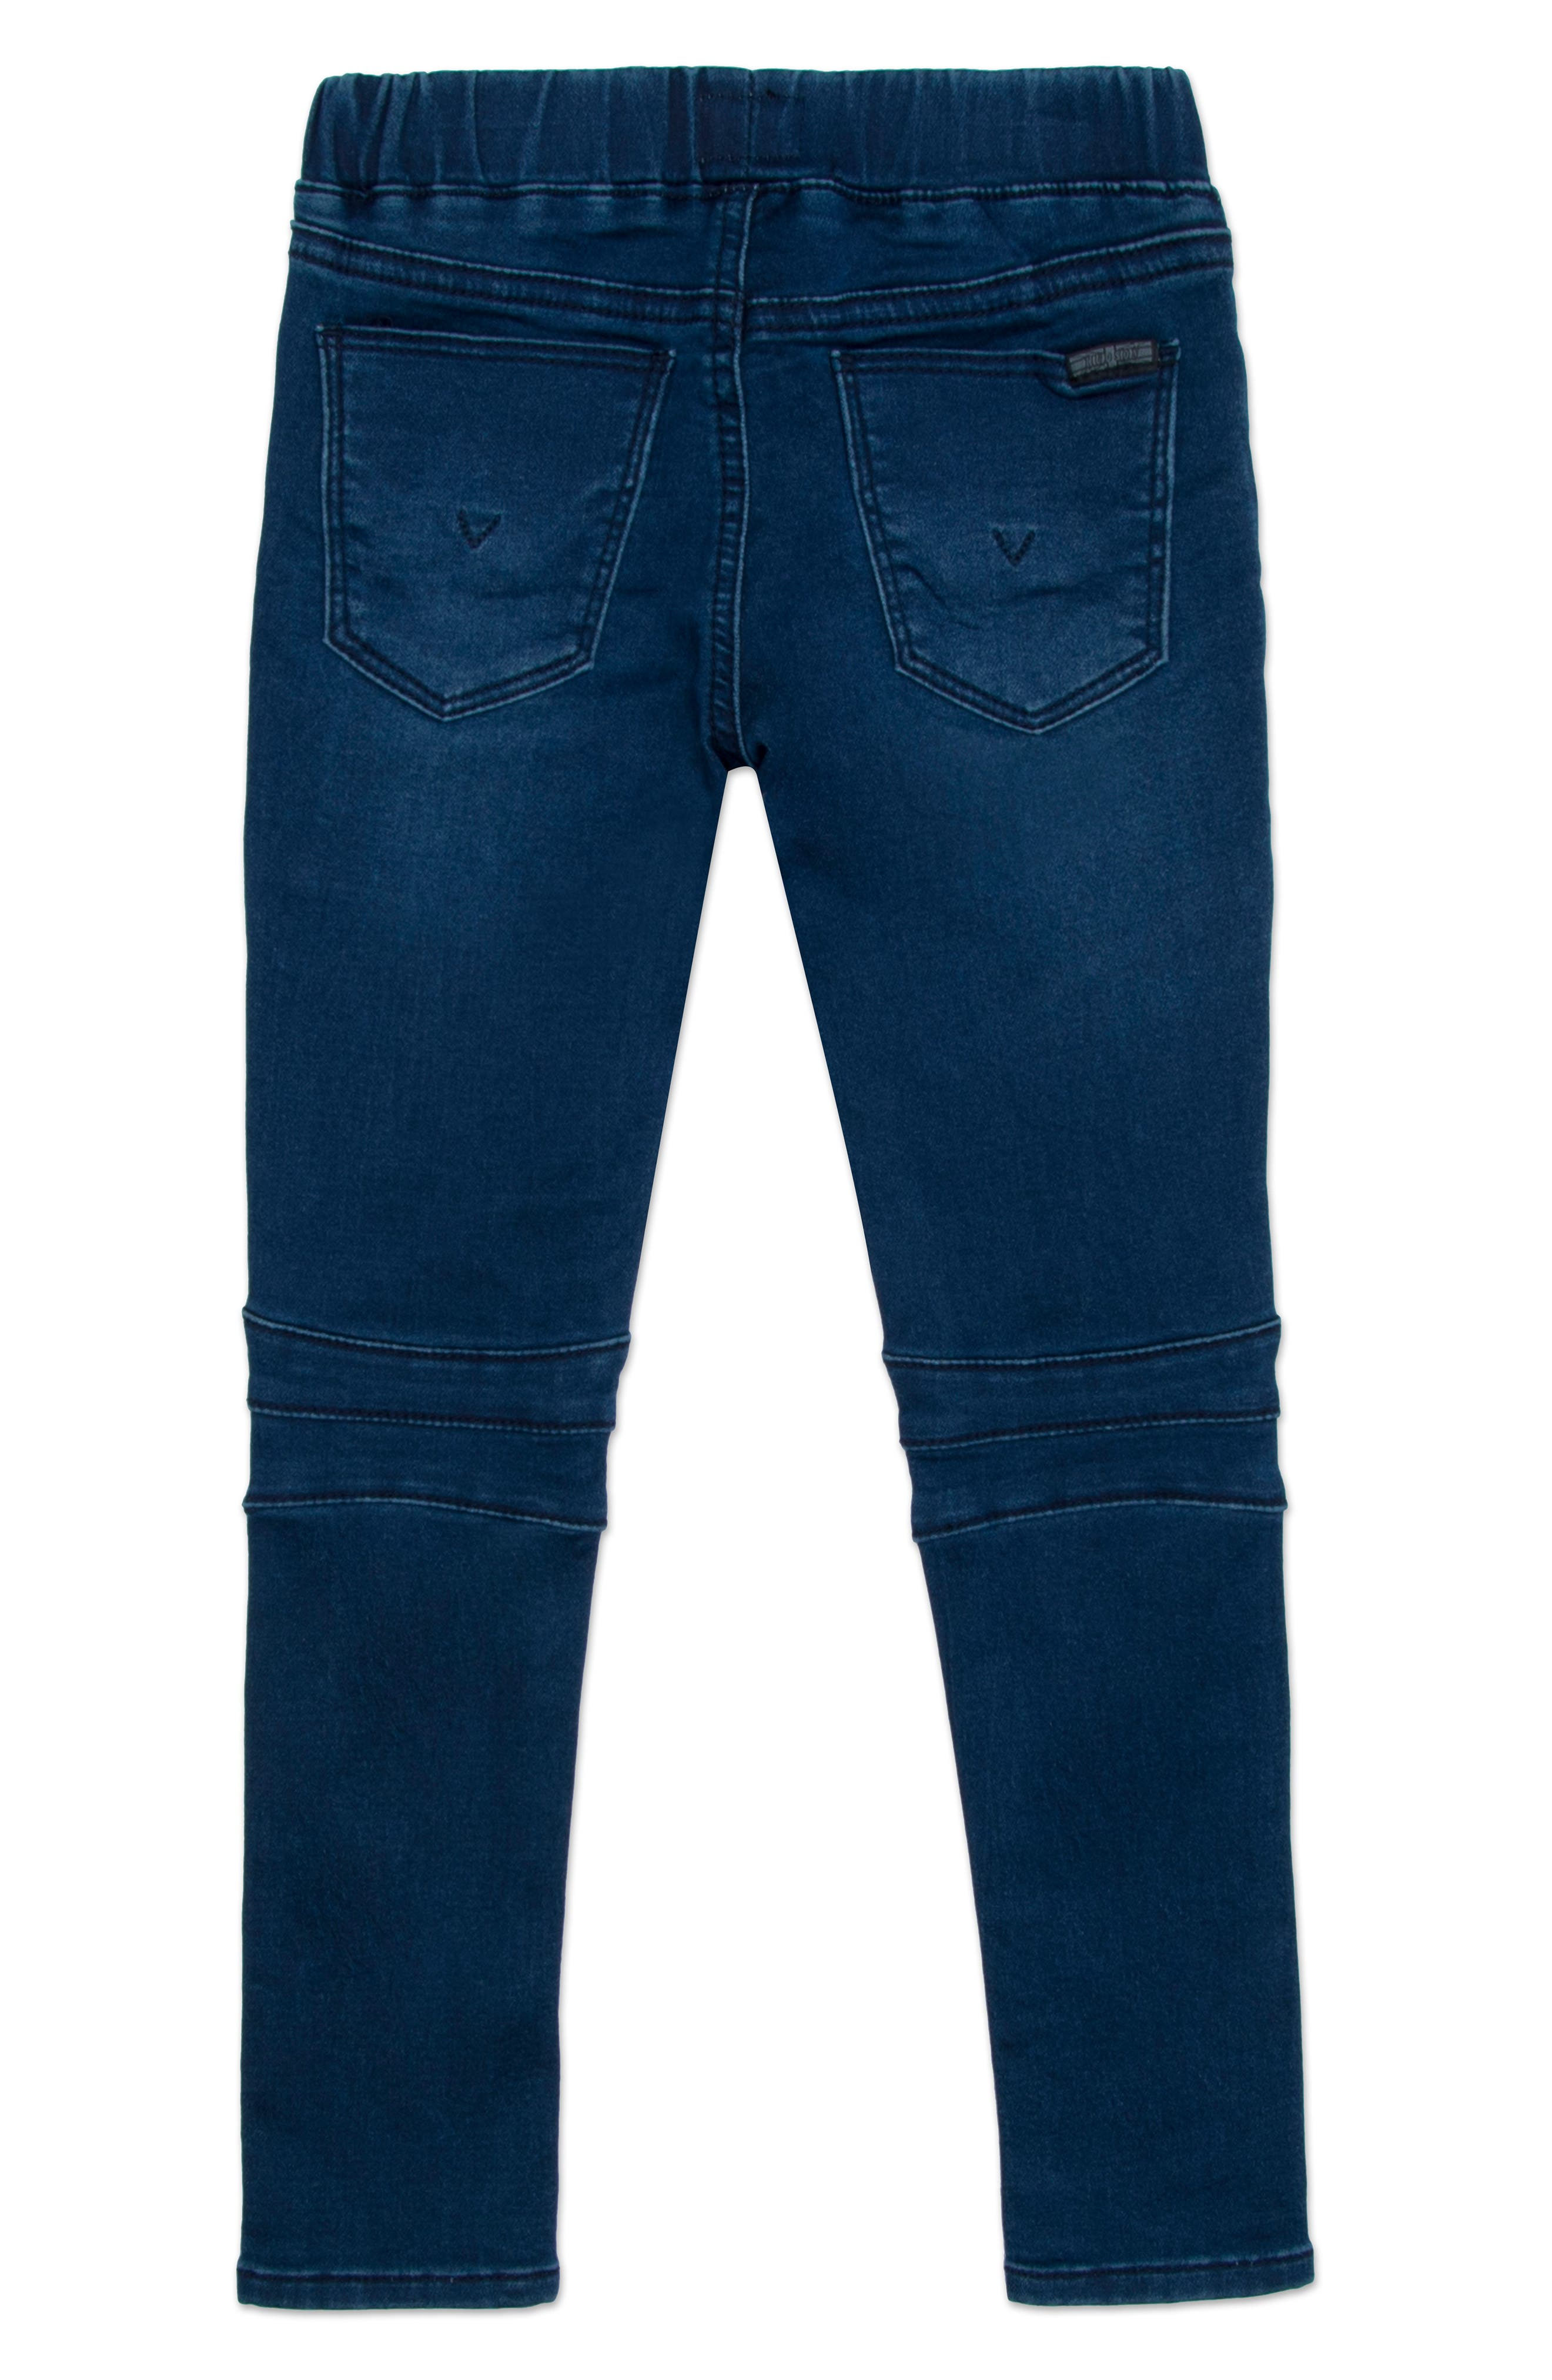 Moto Skinny Jeans,                             Alternate thumbnail 2, color,                             Nile